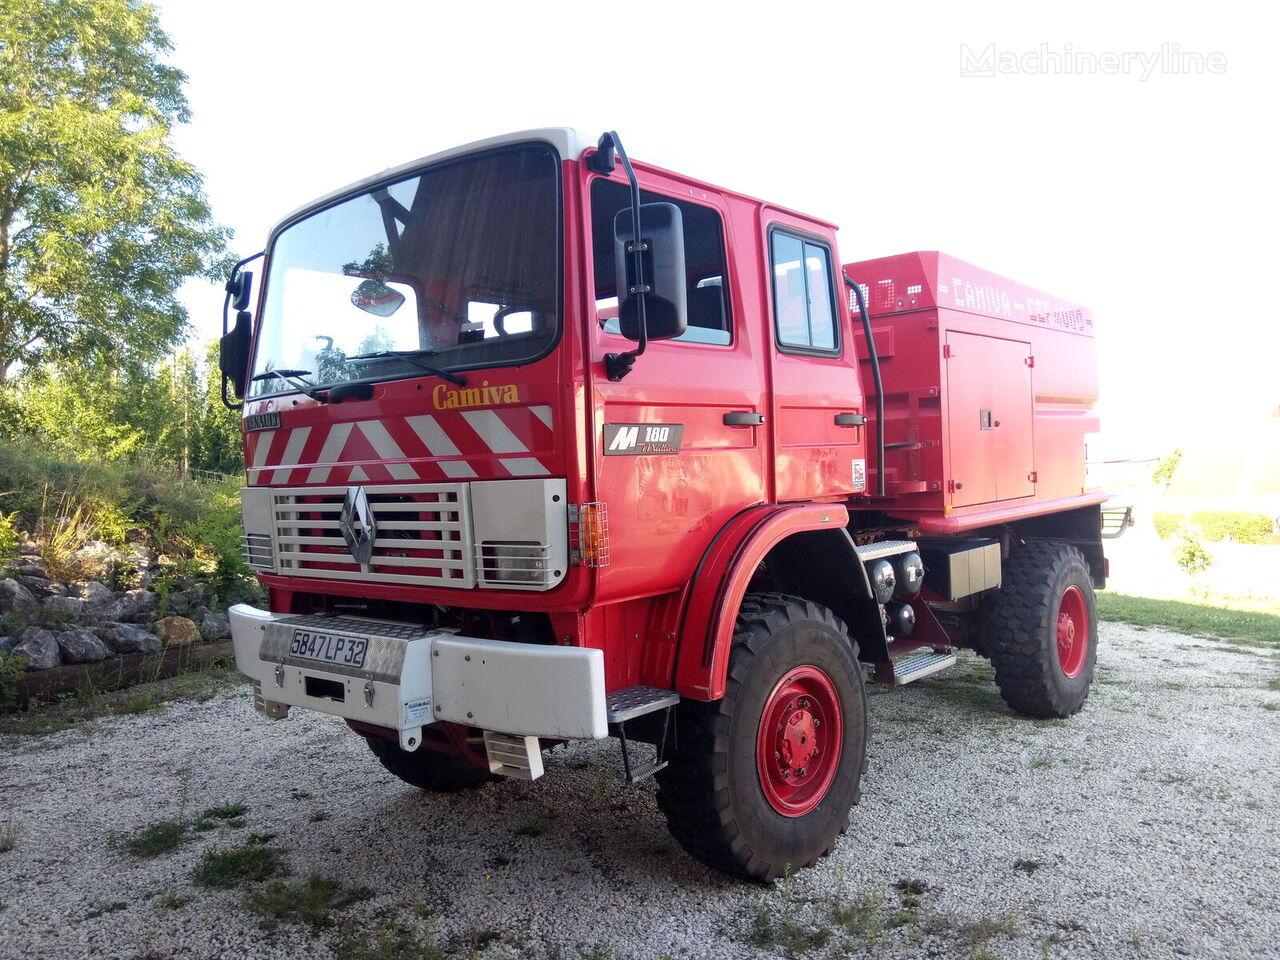 RENAULT M180 4x4 - CCF4000 fire truck